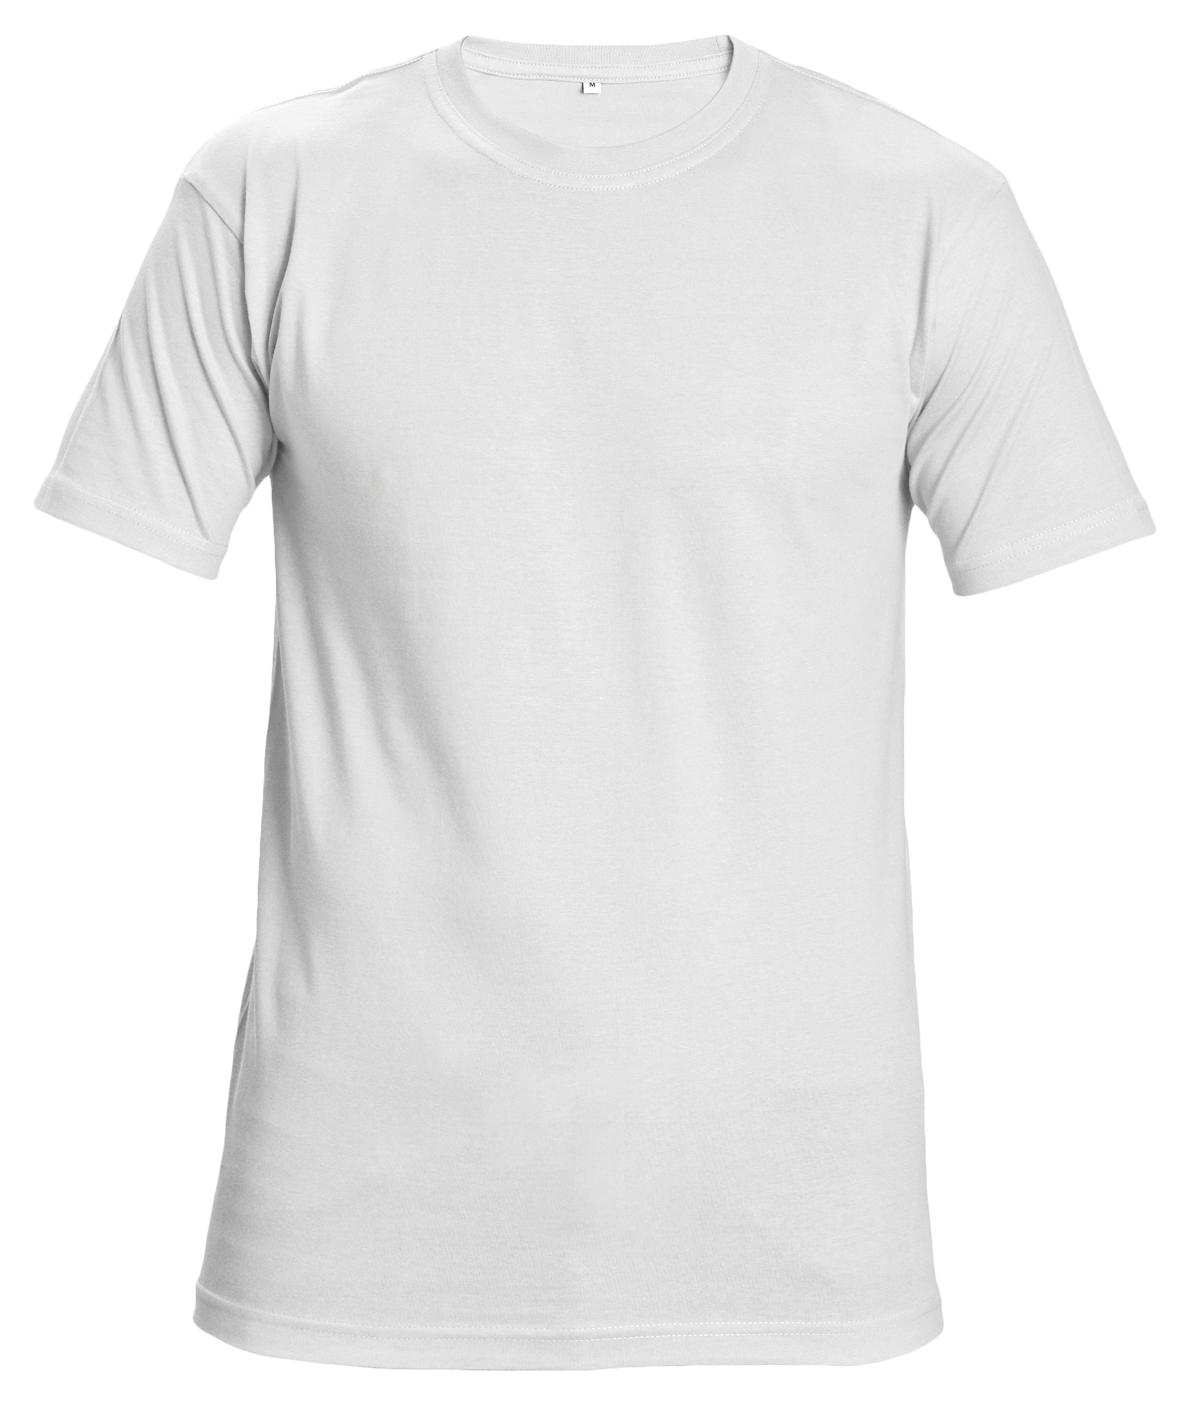 Image of   T-shirt Teesta kort ærme